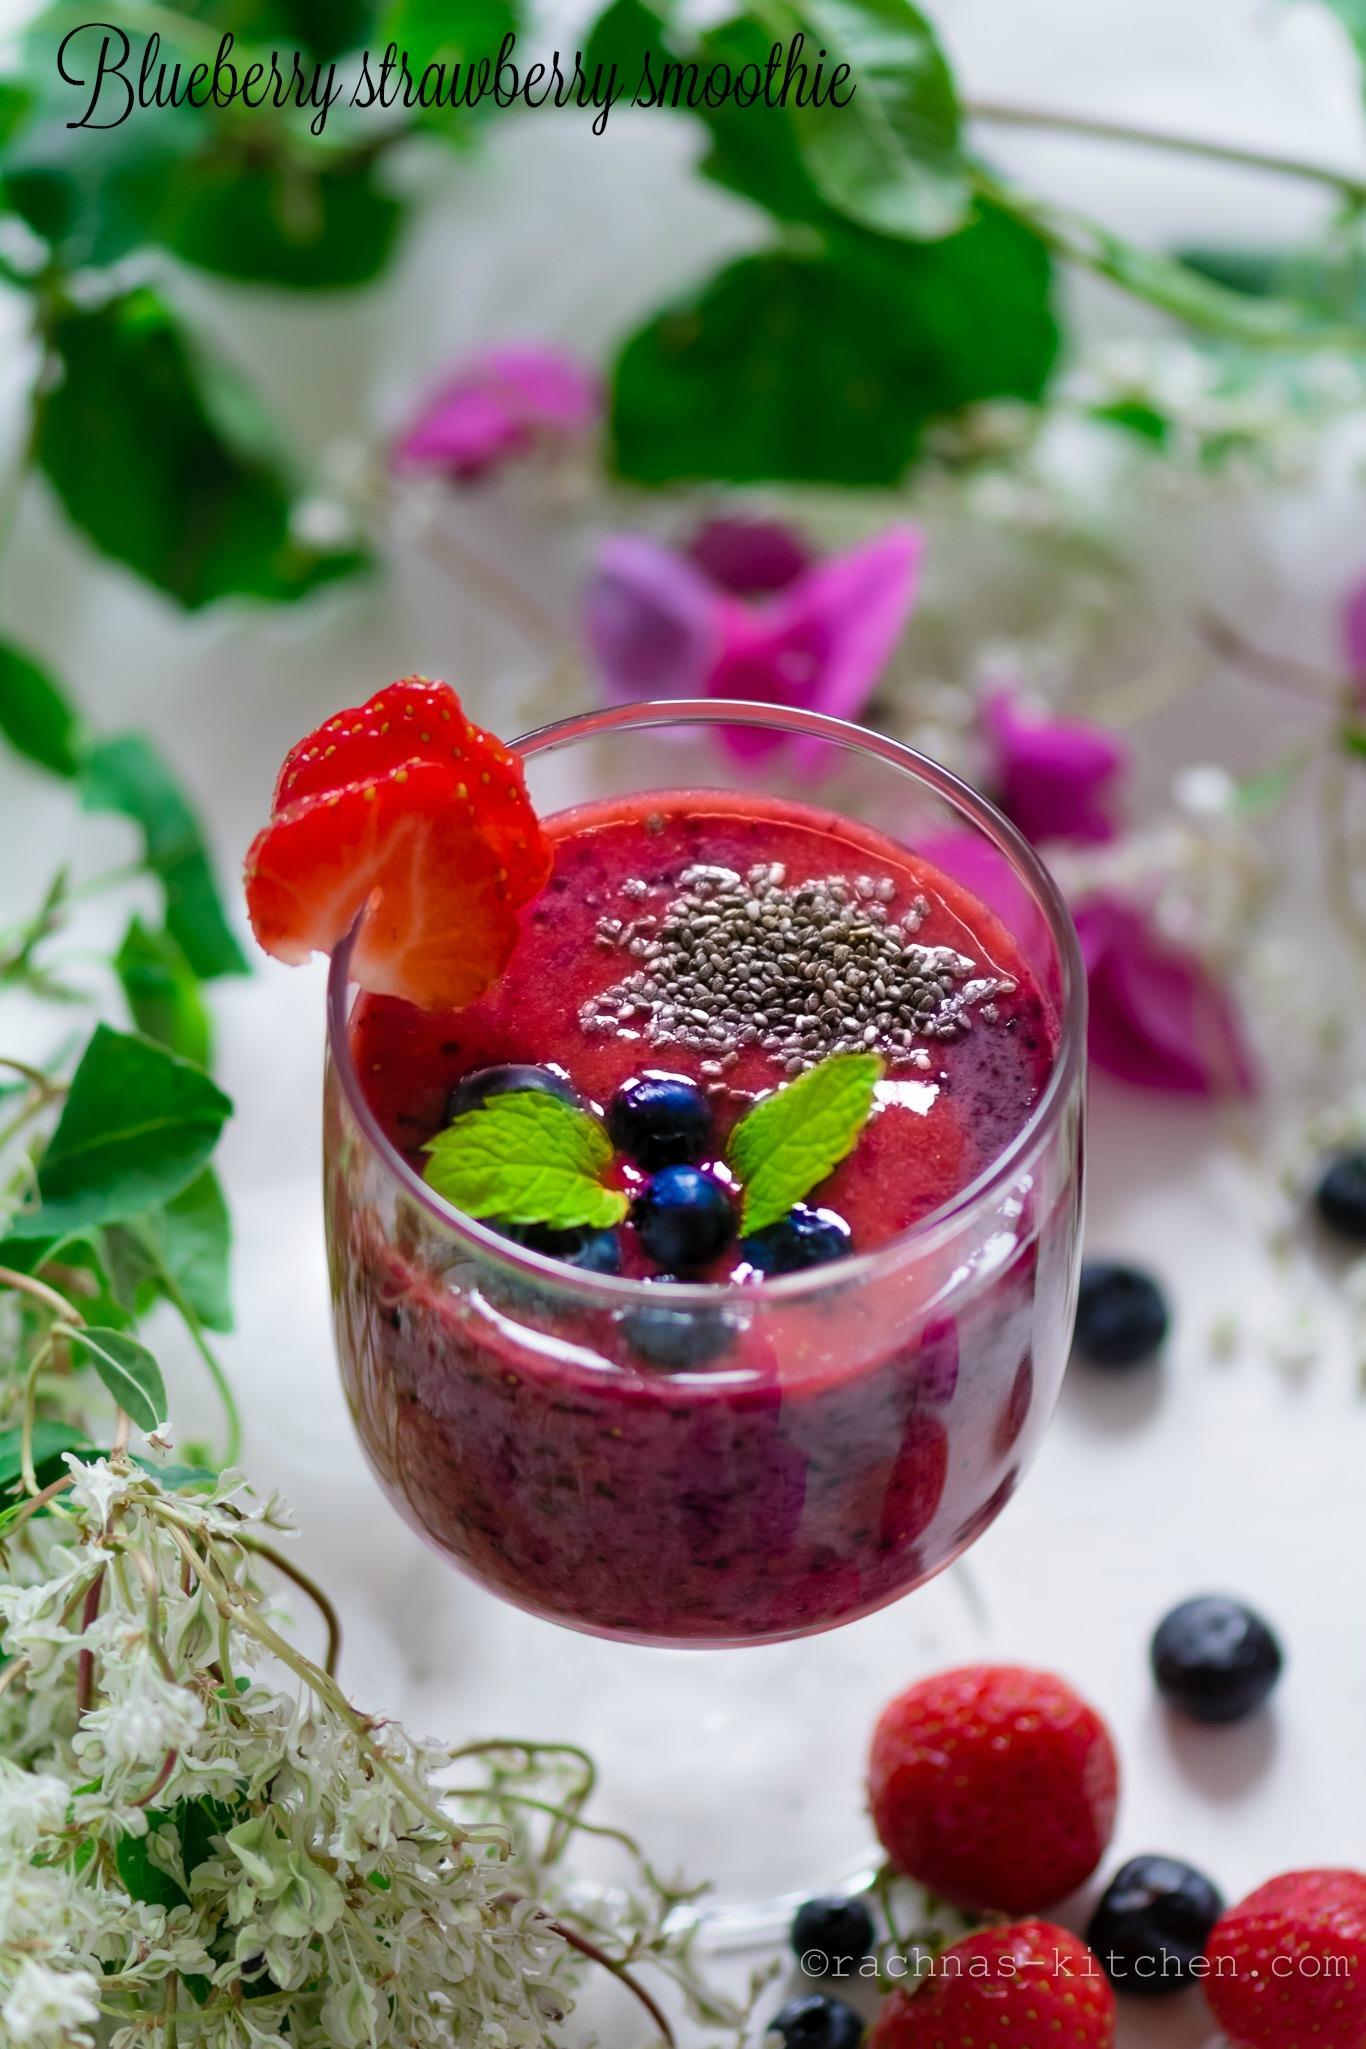 Strawberry blueberry smoothie recipe